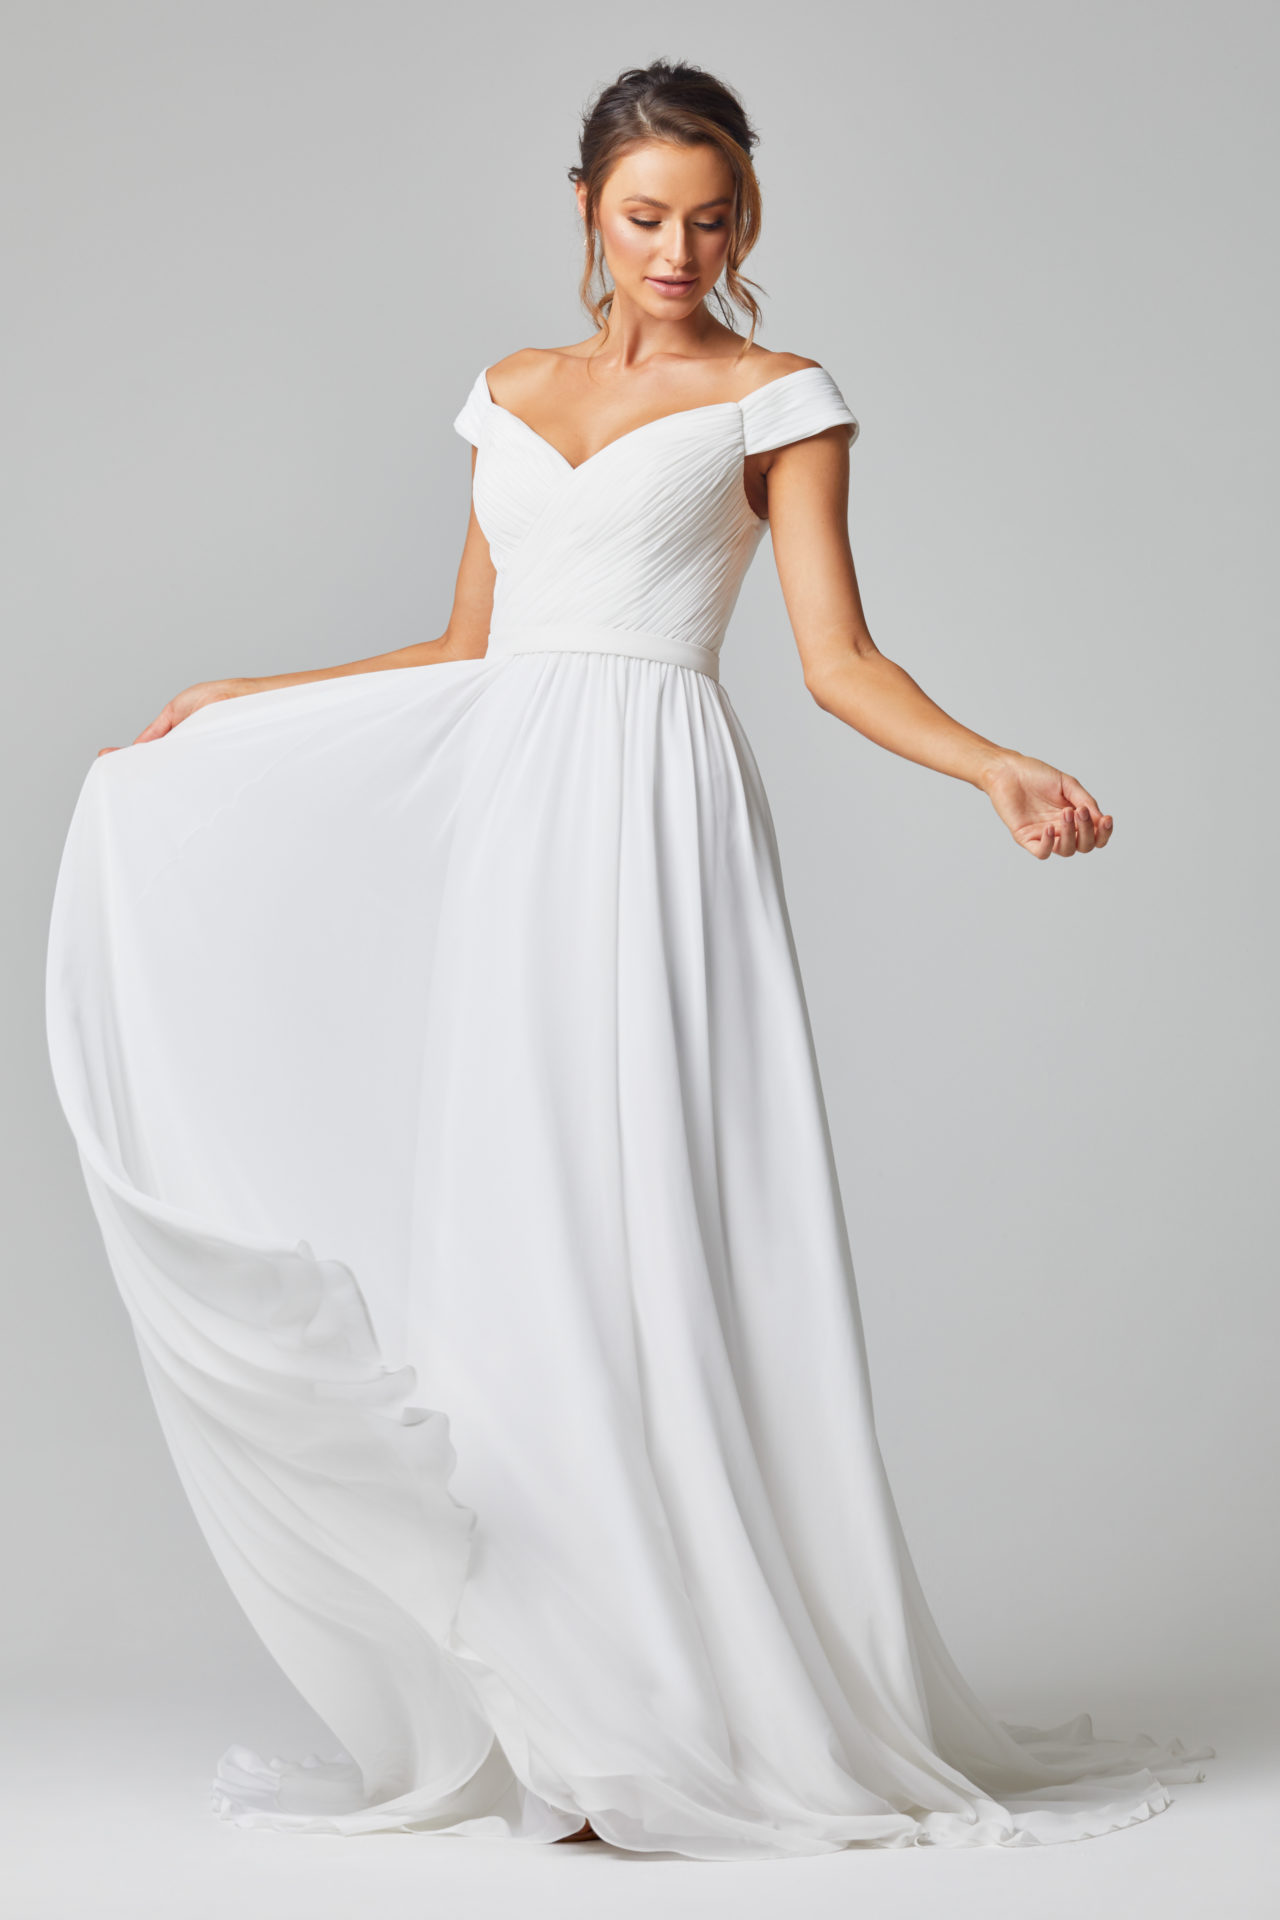 TC323 Annabelle wedding dress side front